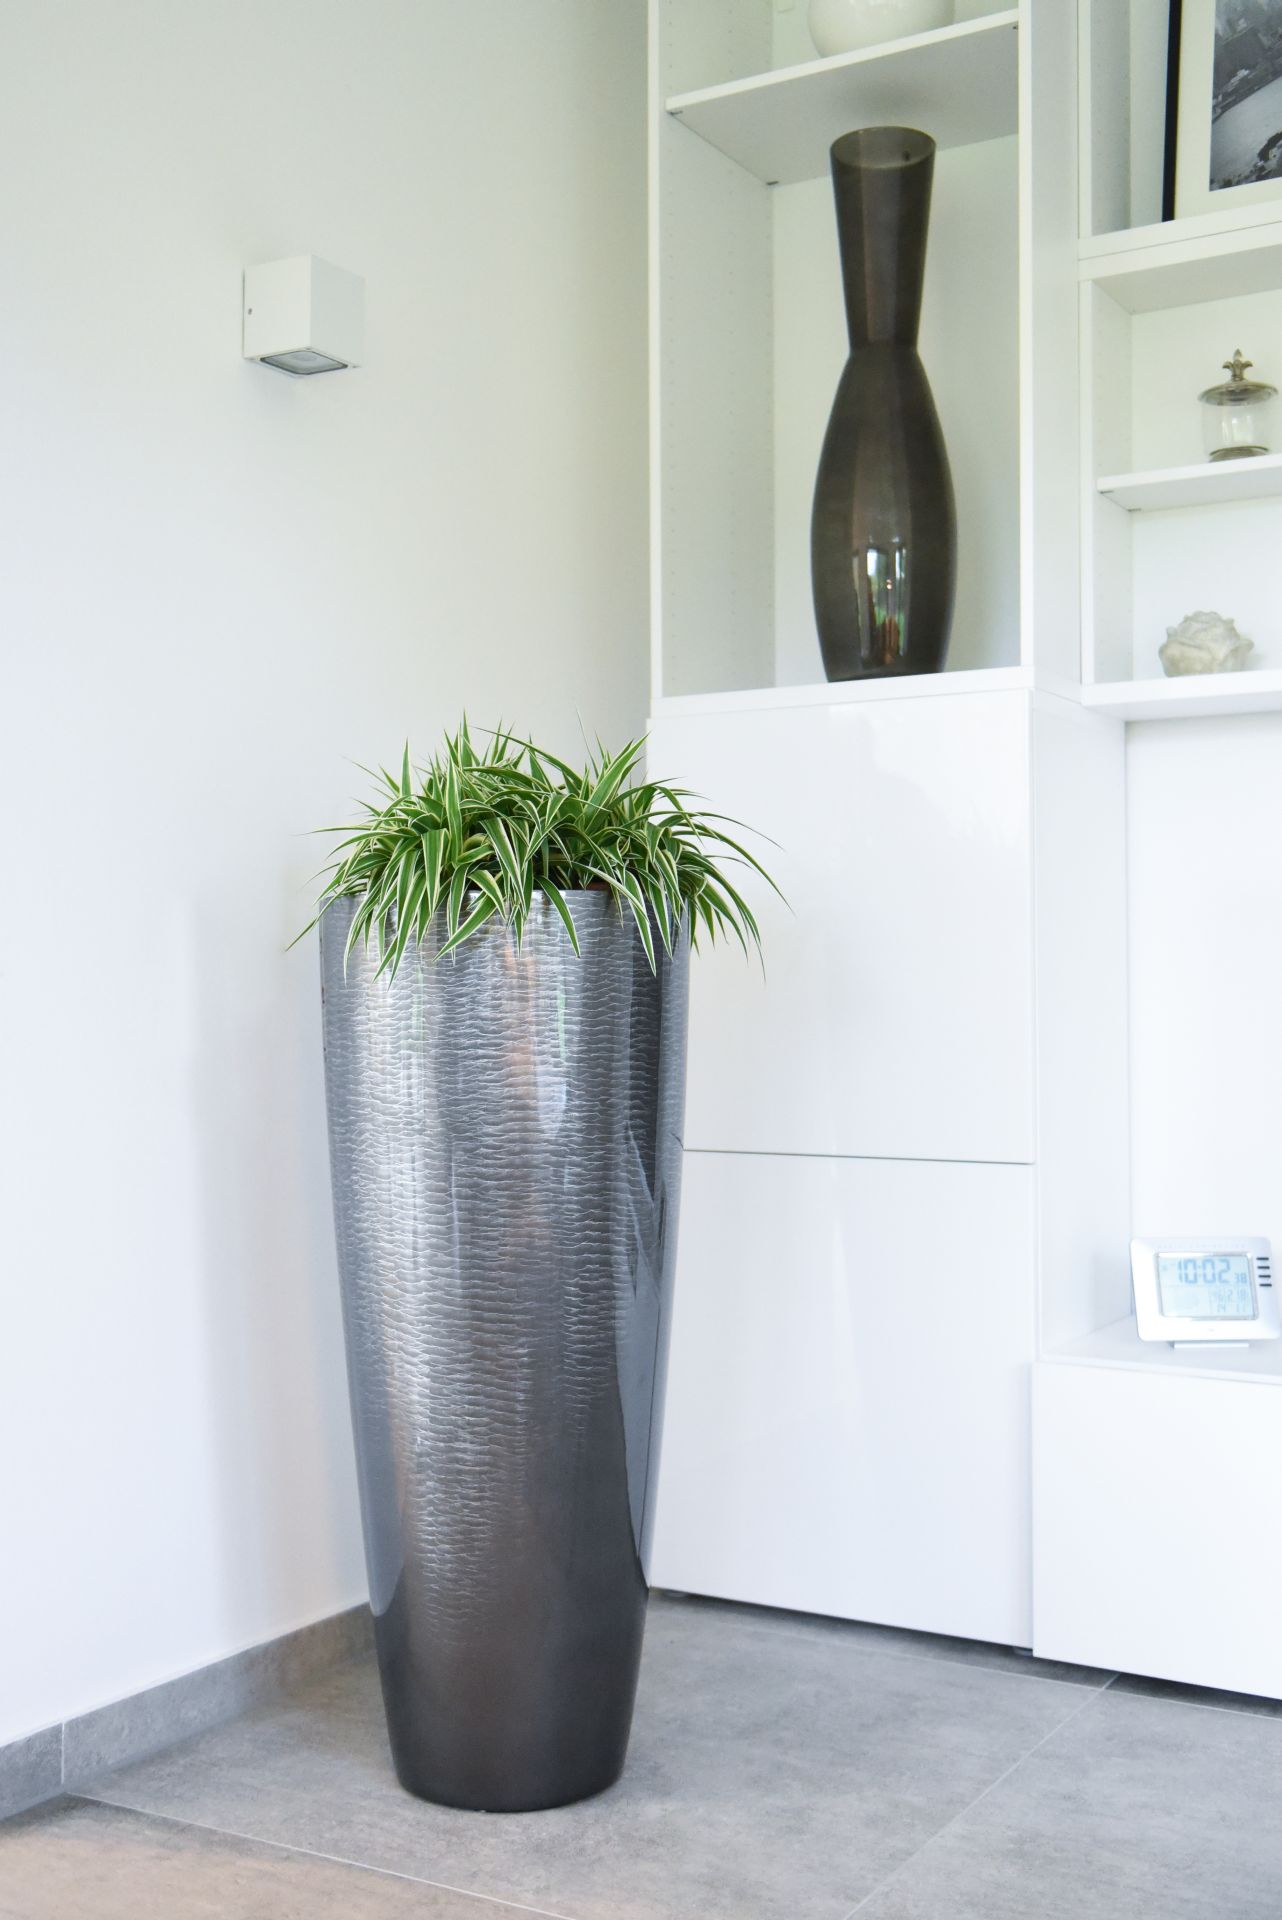 pflanzk bel pflanzgef bodenvase schlangenoptik metro 100 cm silber hochglanz ebay. Black Bedroom Furniture Sets. Home Design Ideas